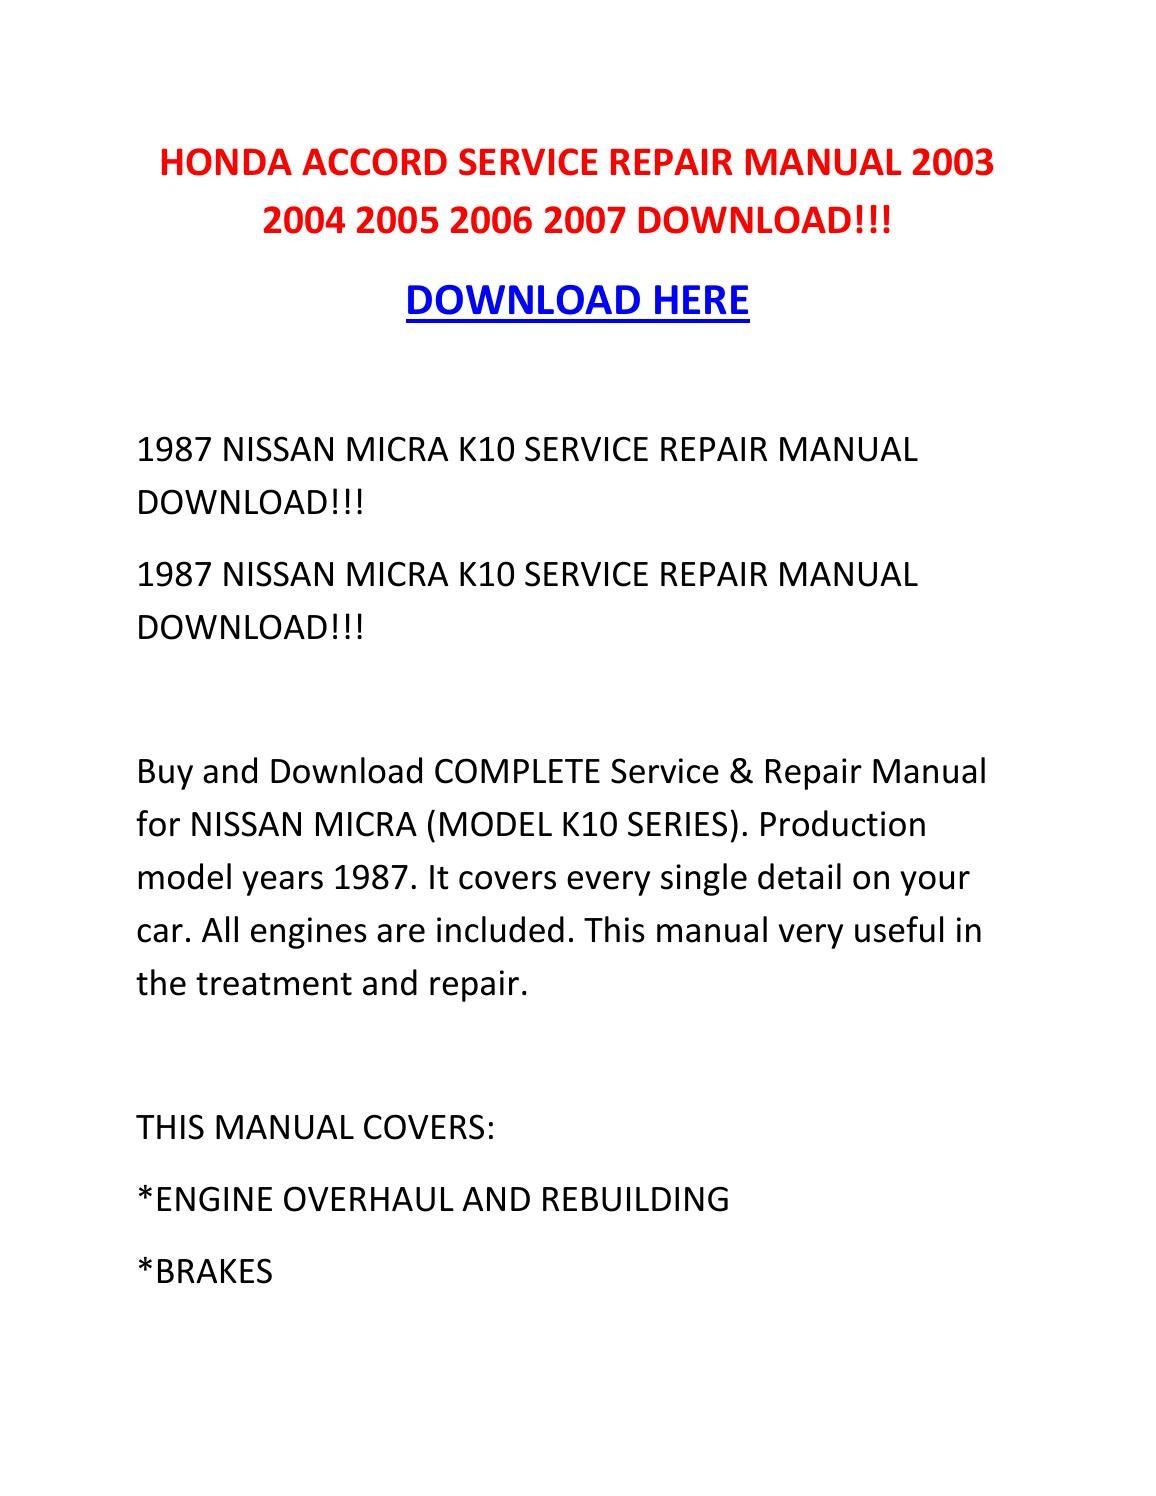 2004 honda accord repair manual